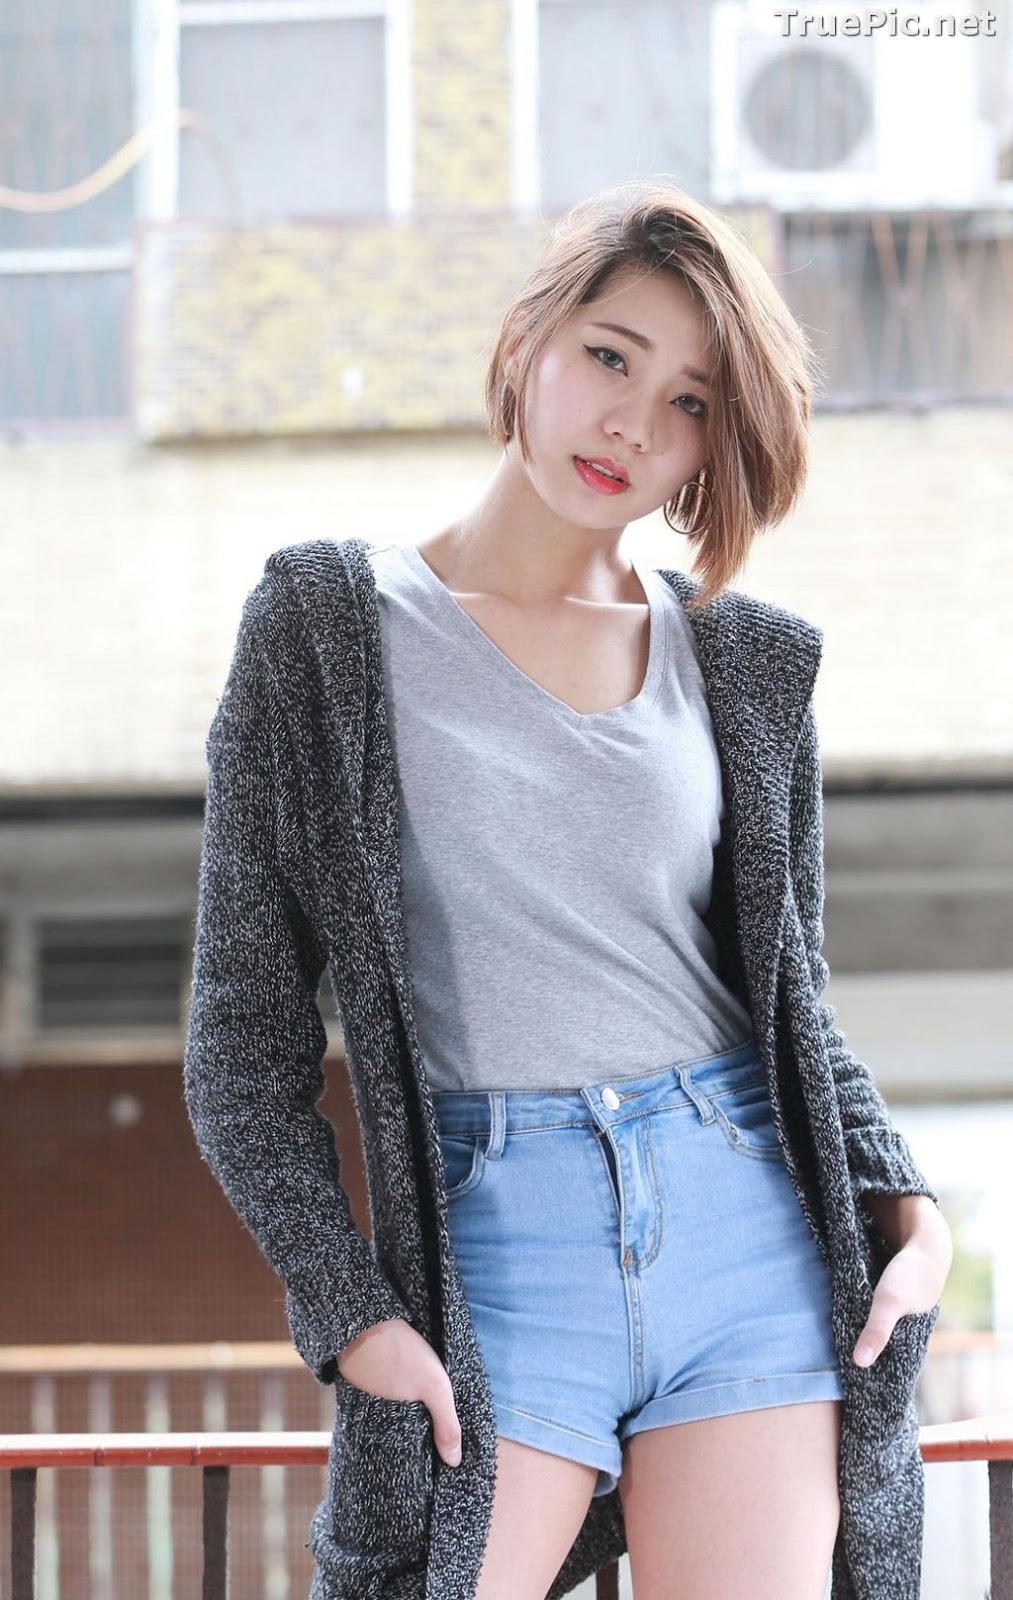 Image Pretty Taiwan Showgirl - 黃竹萱 - Beautiful Long Legs Girl - TruePic.net - Picture-3